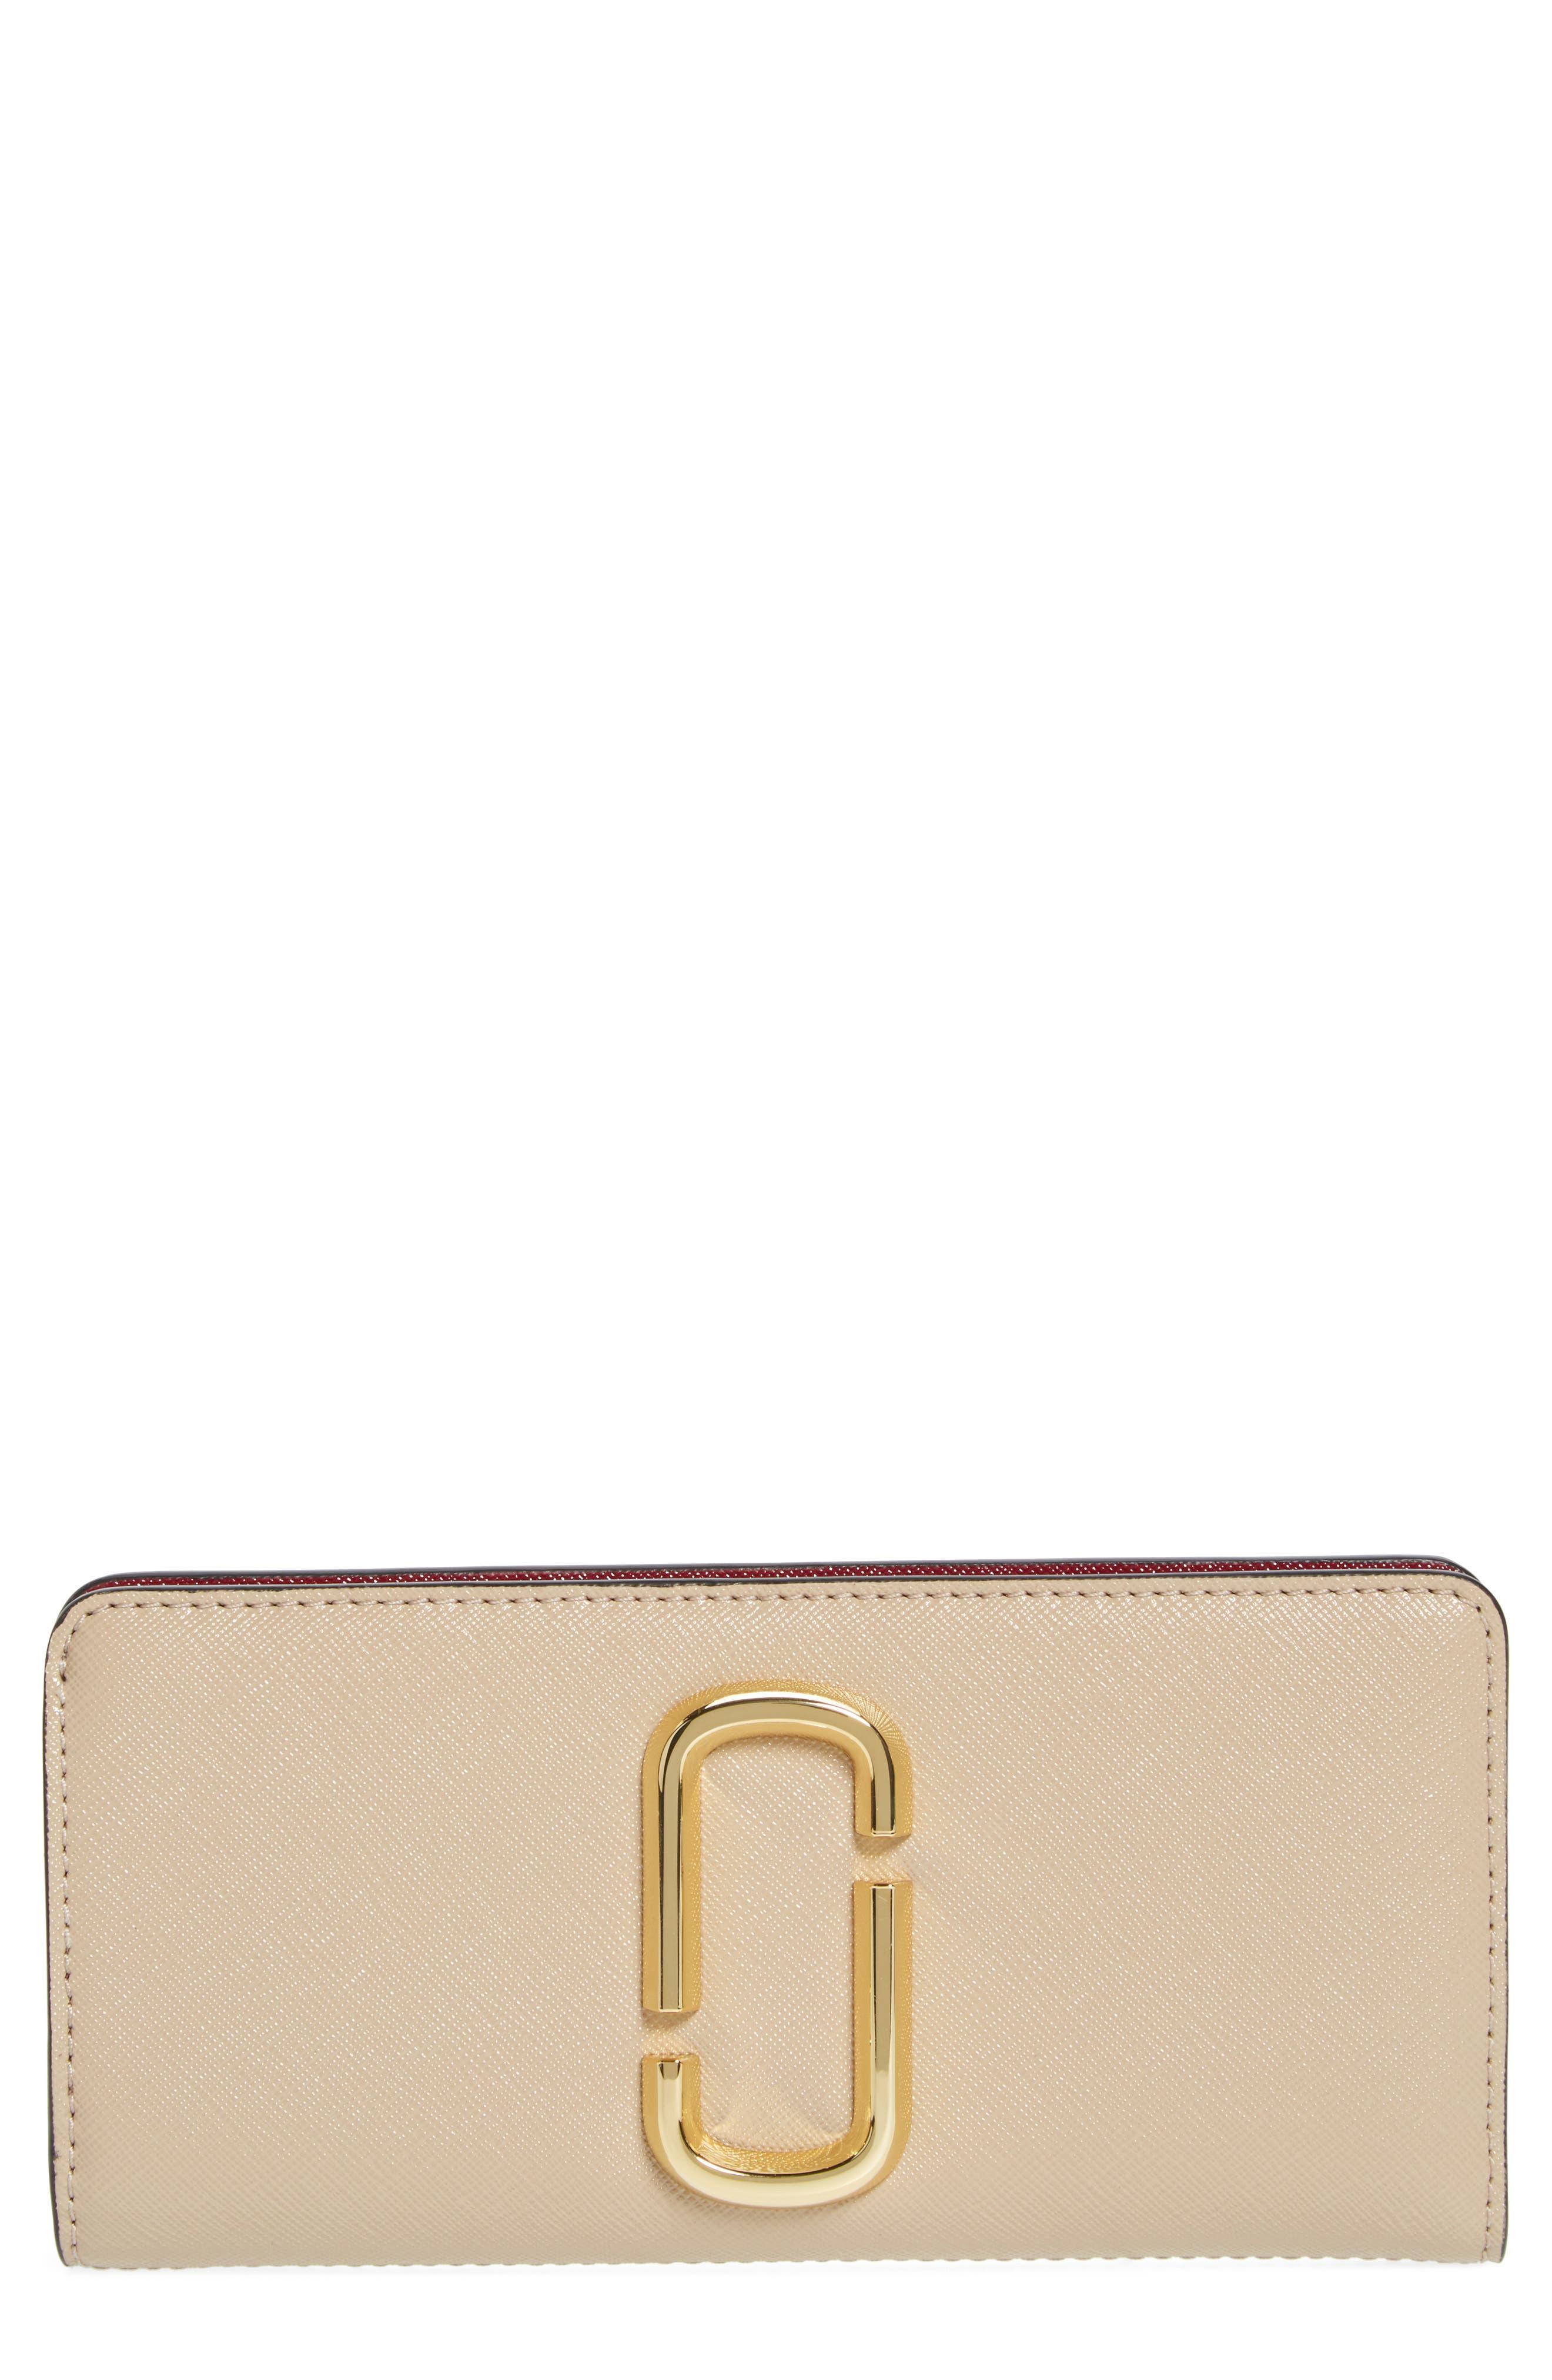 Snapshot Open Face Leather Wallet,                         Main,                         color, Light Slate Multi